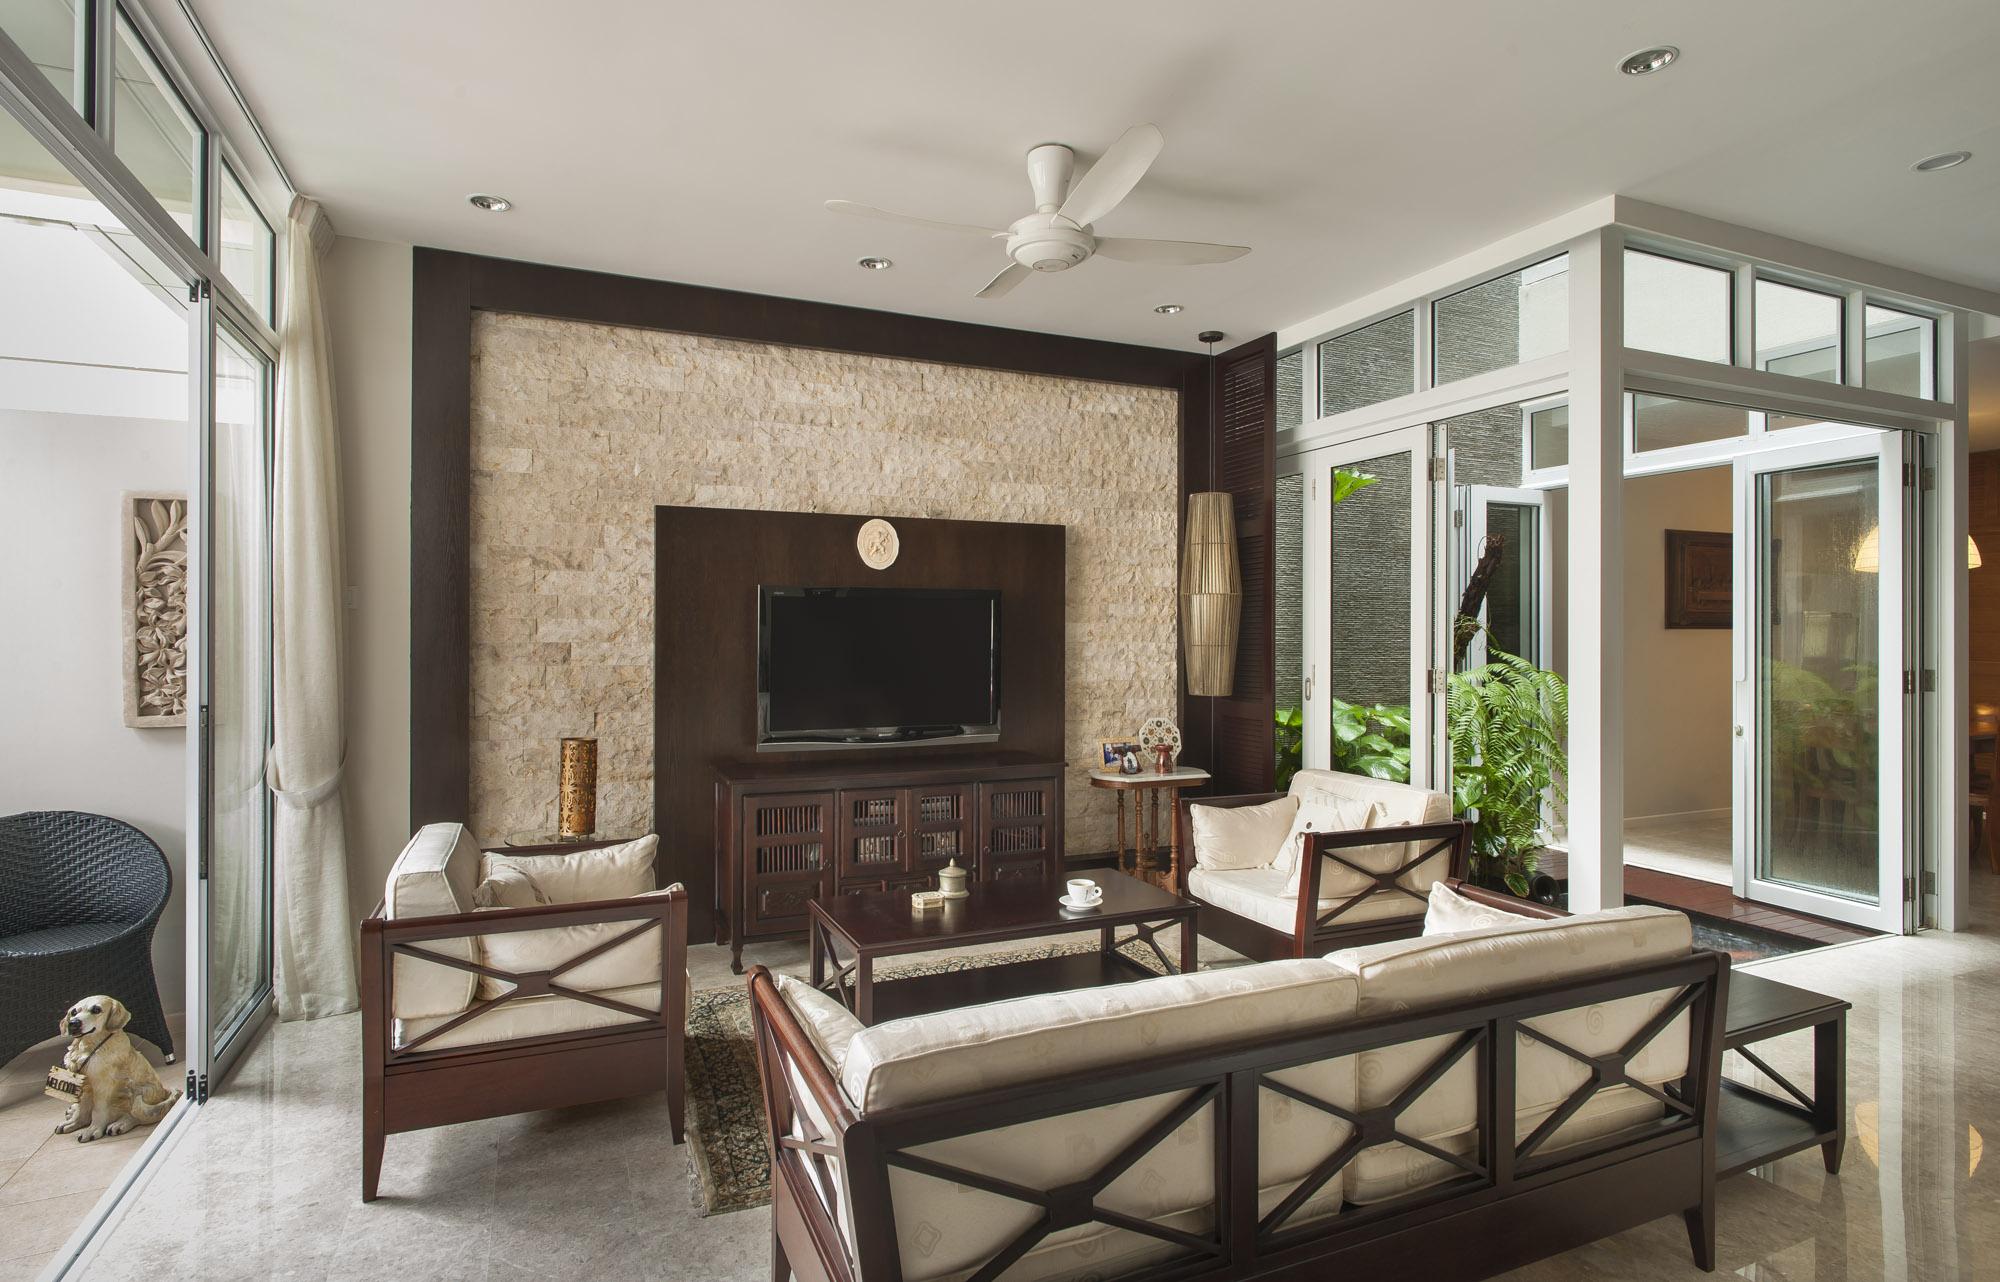 Rezt and Relax Interior - The HipVan Blog